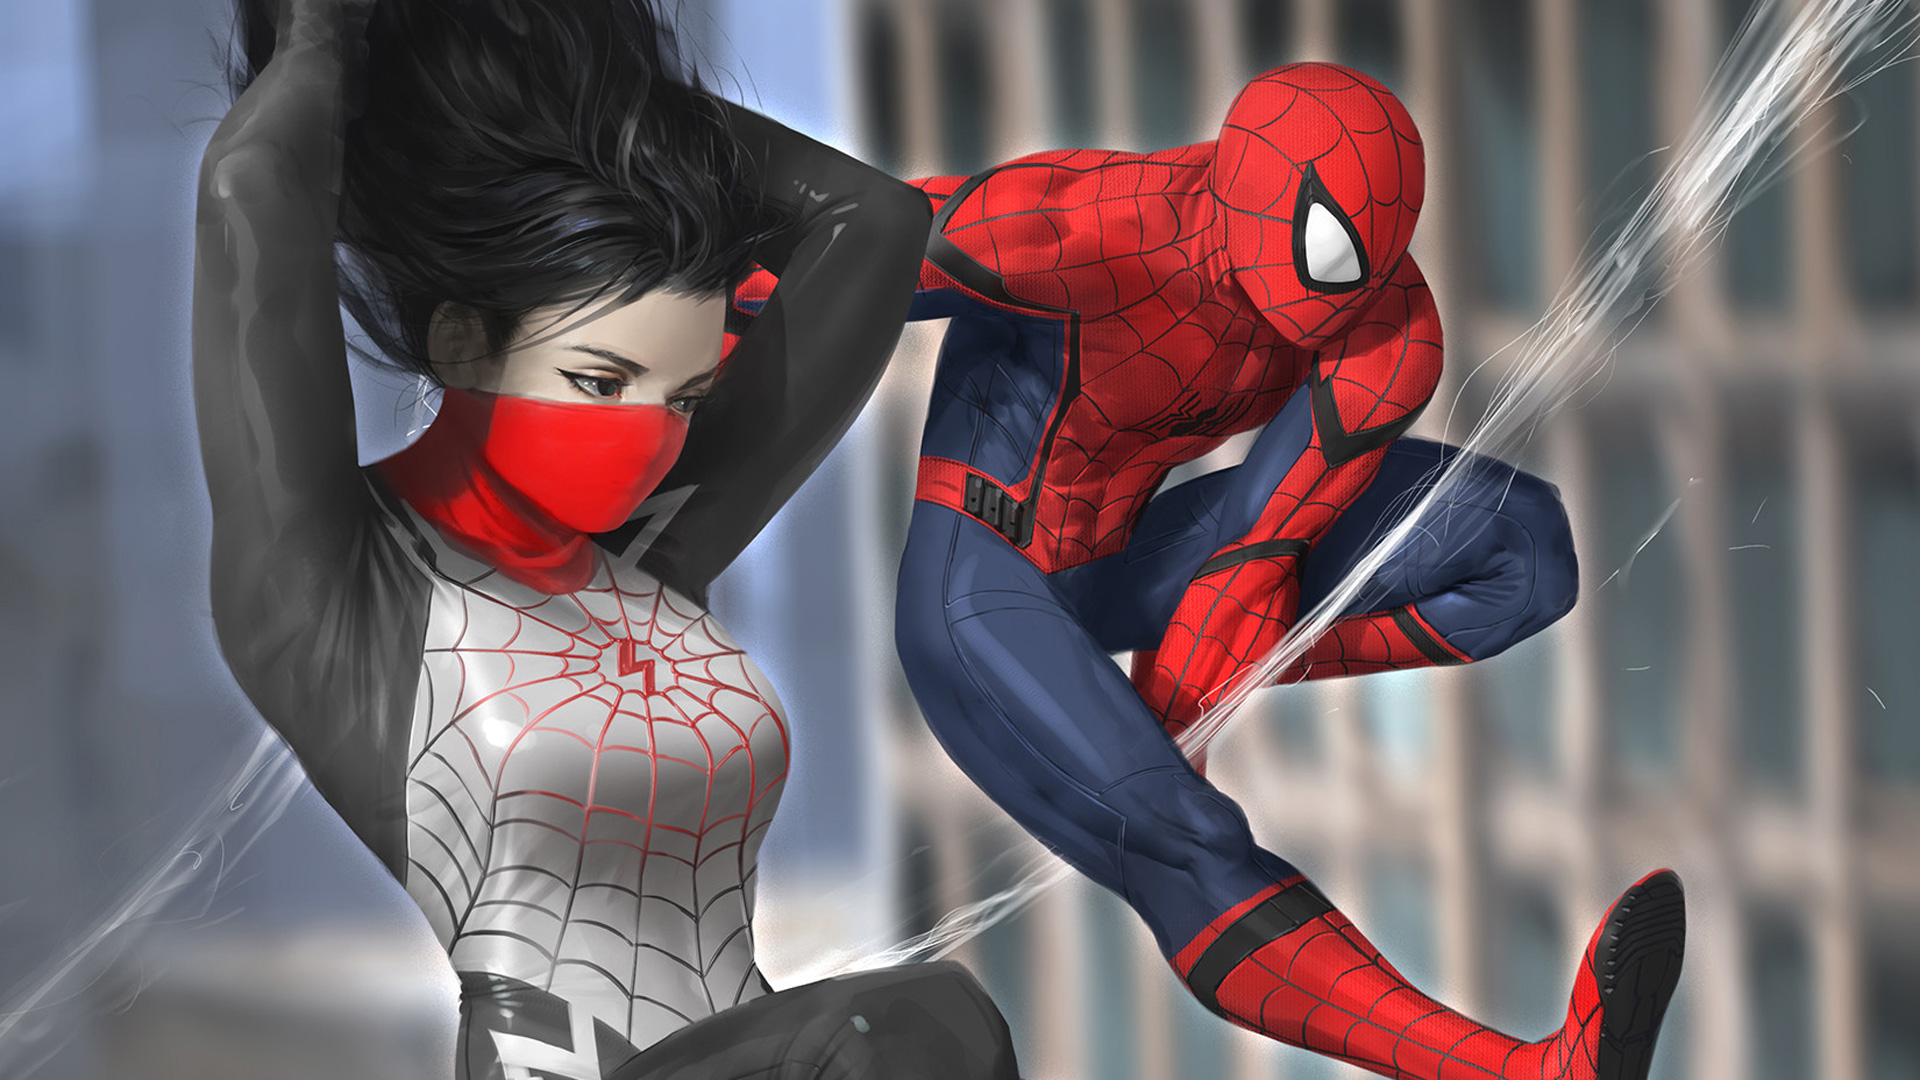 Wallpaper Spiderman and Silk